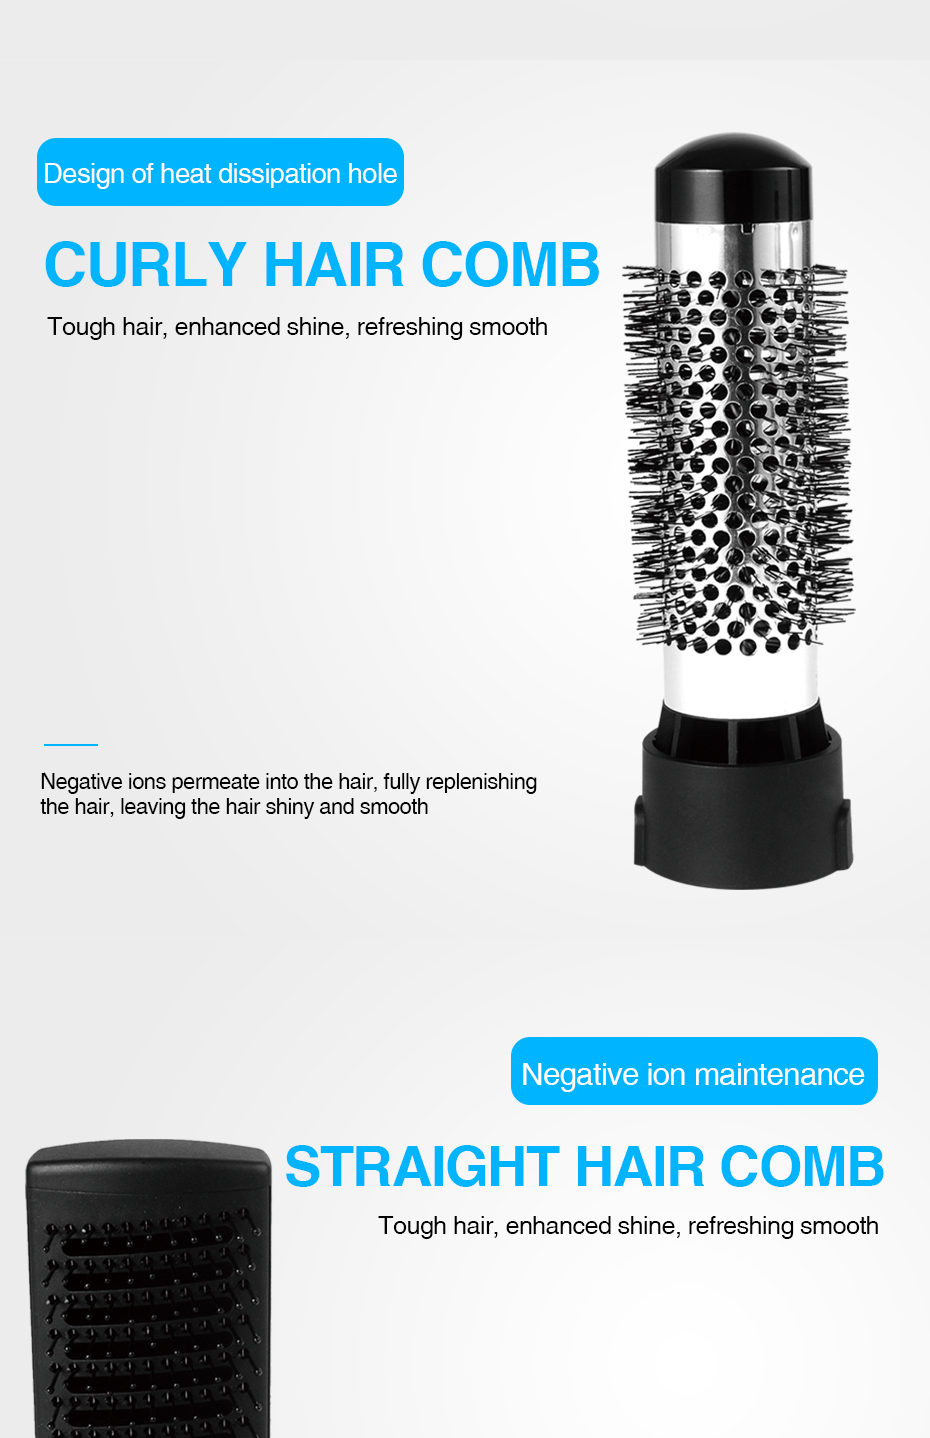 secador de cabelo secador de cabelo secador